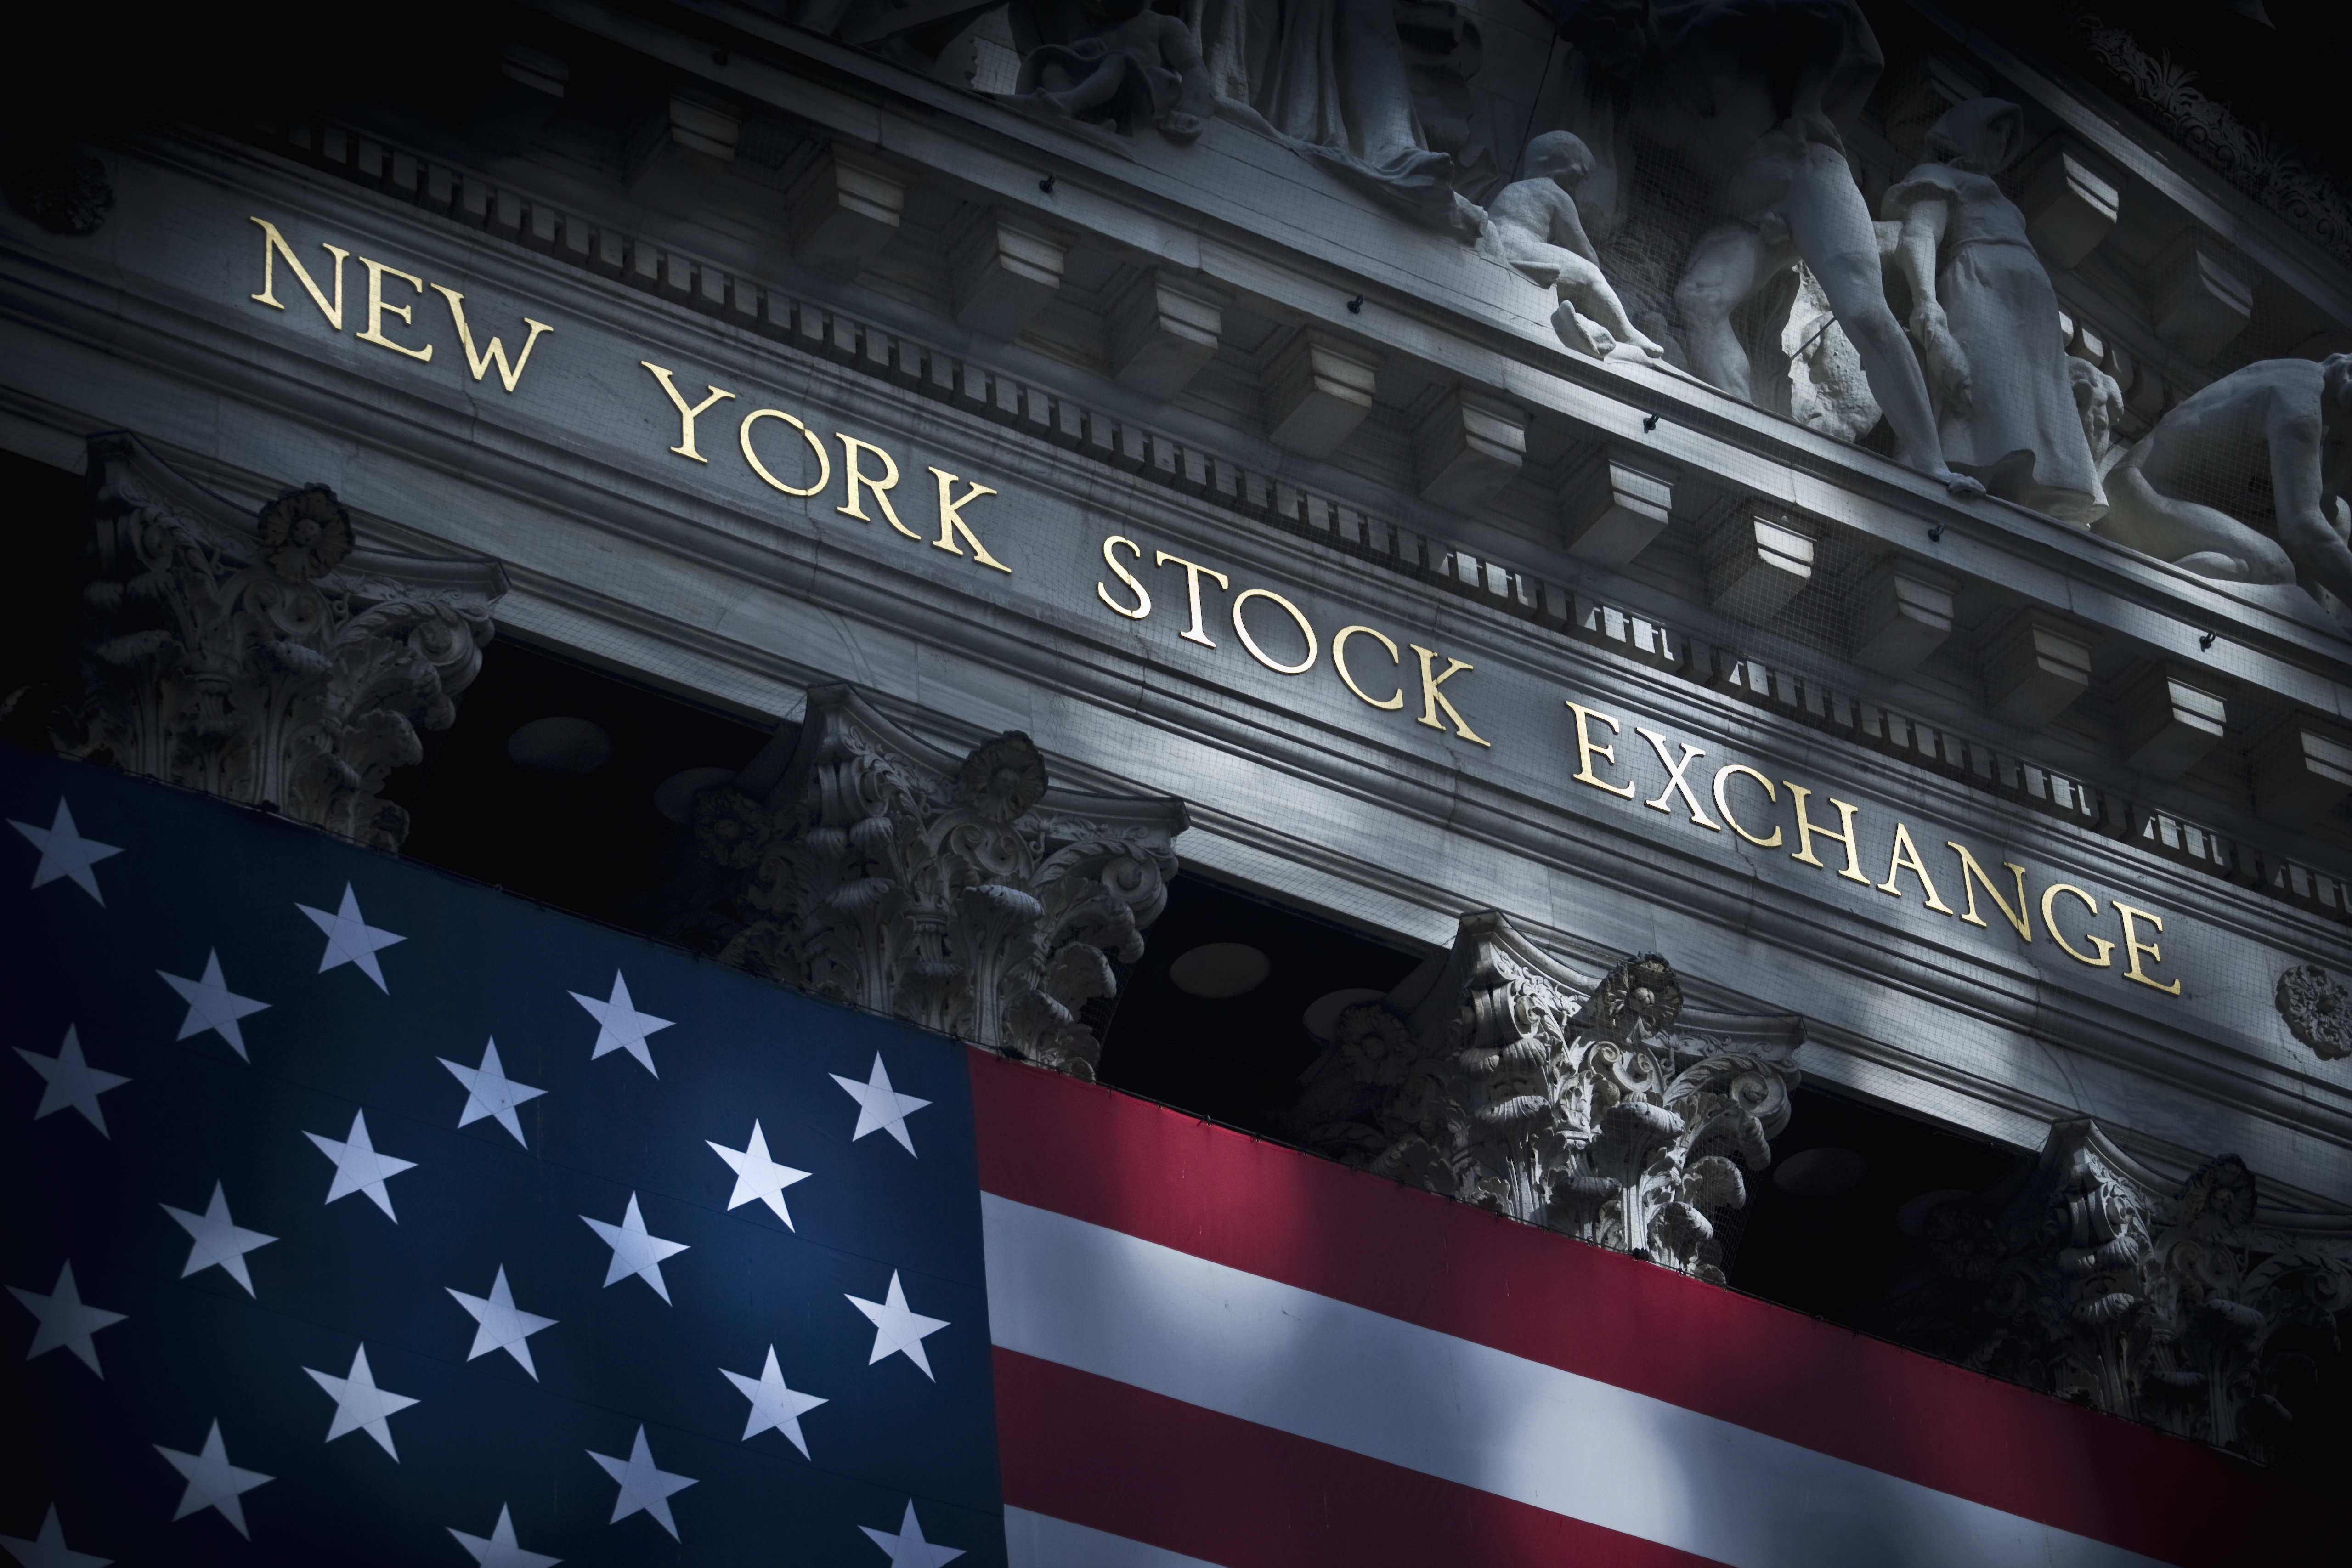 Wall Street in Manhattan, New York.